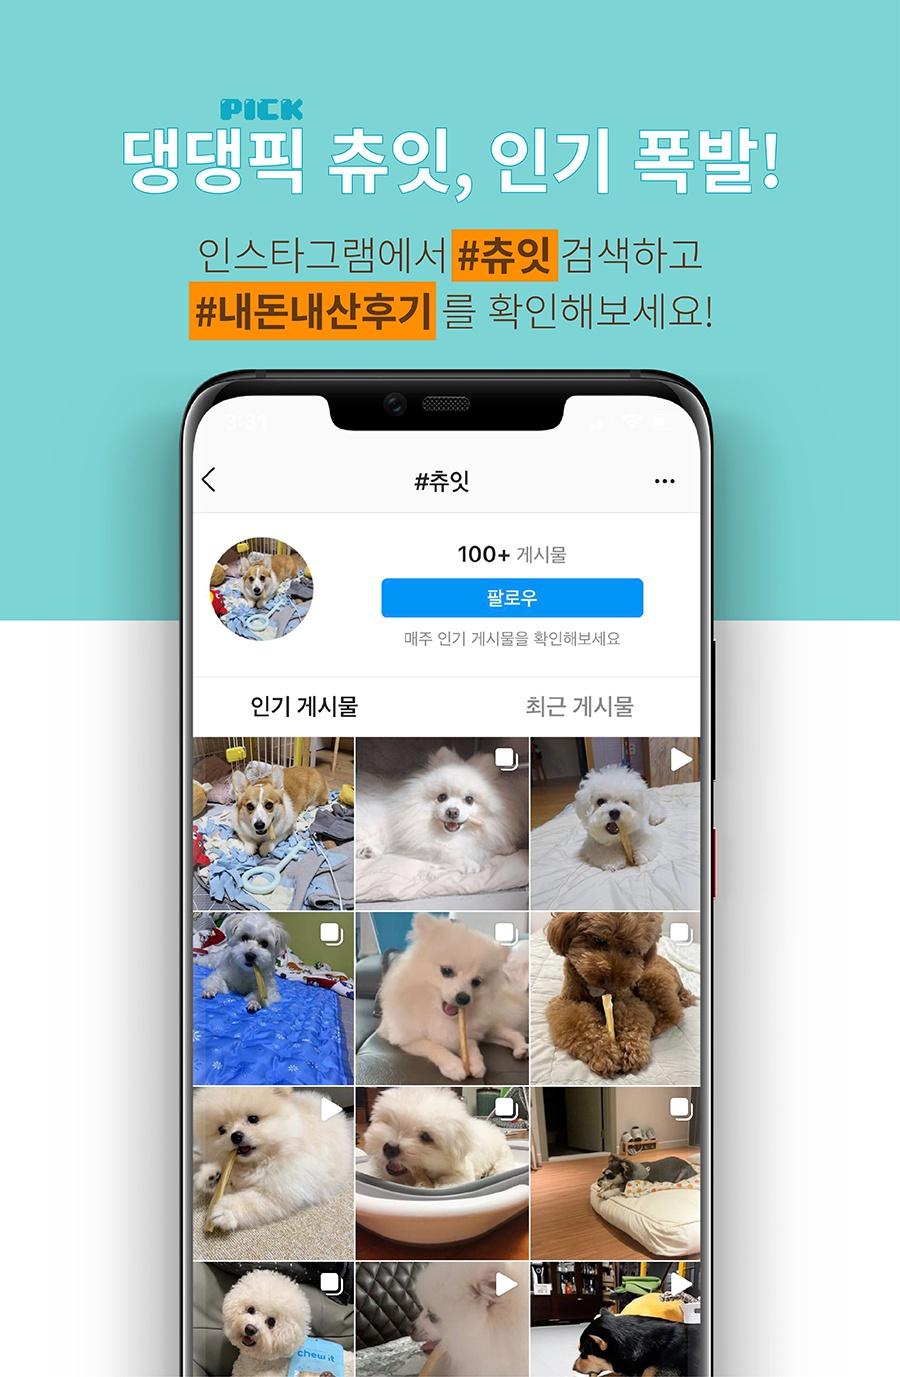 [EVENT] 츄잇 플레인-상품이미지-2